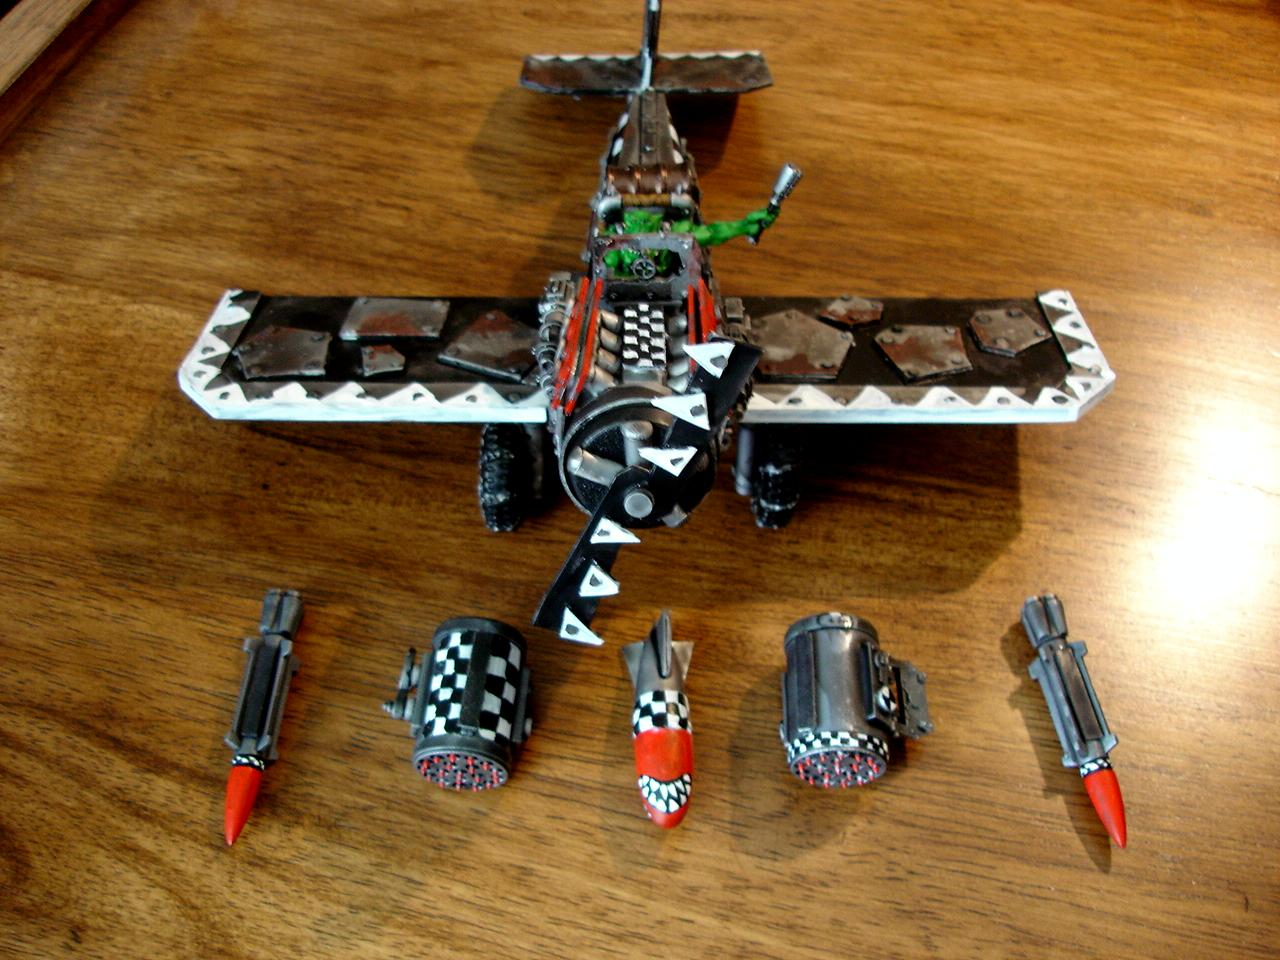 Conversion, Fighta-bomba, Fightabomma, Orks, Plane, Rockets, Warhammer 40,000